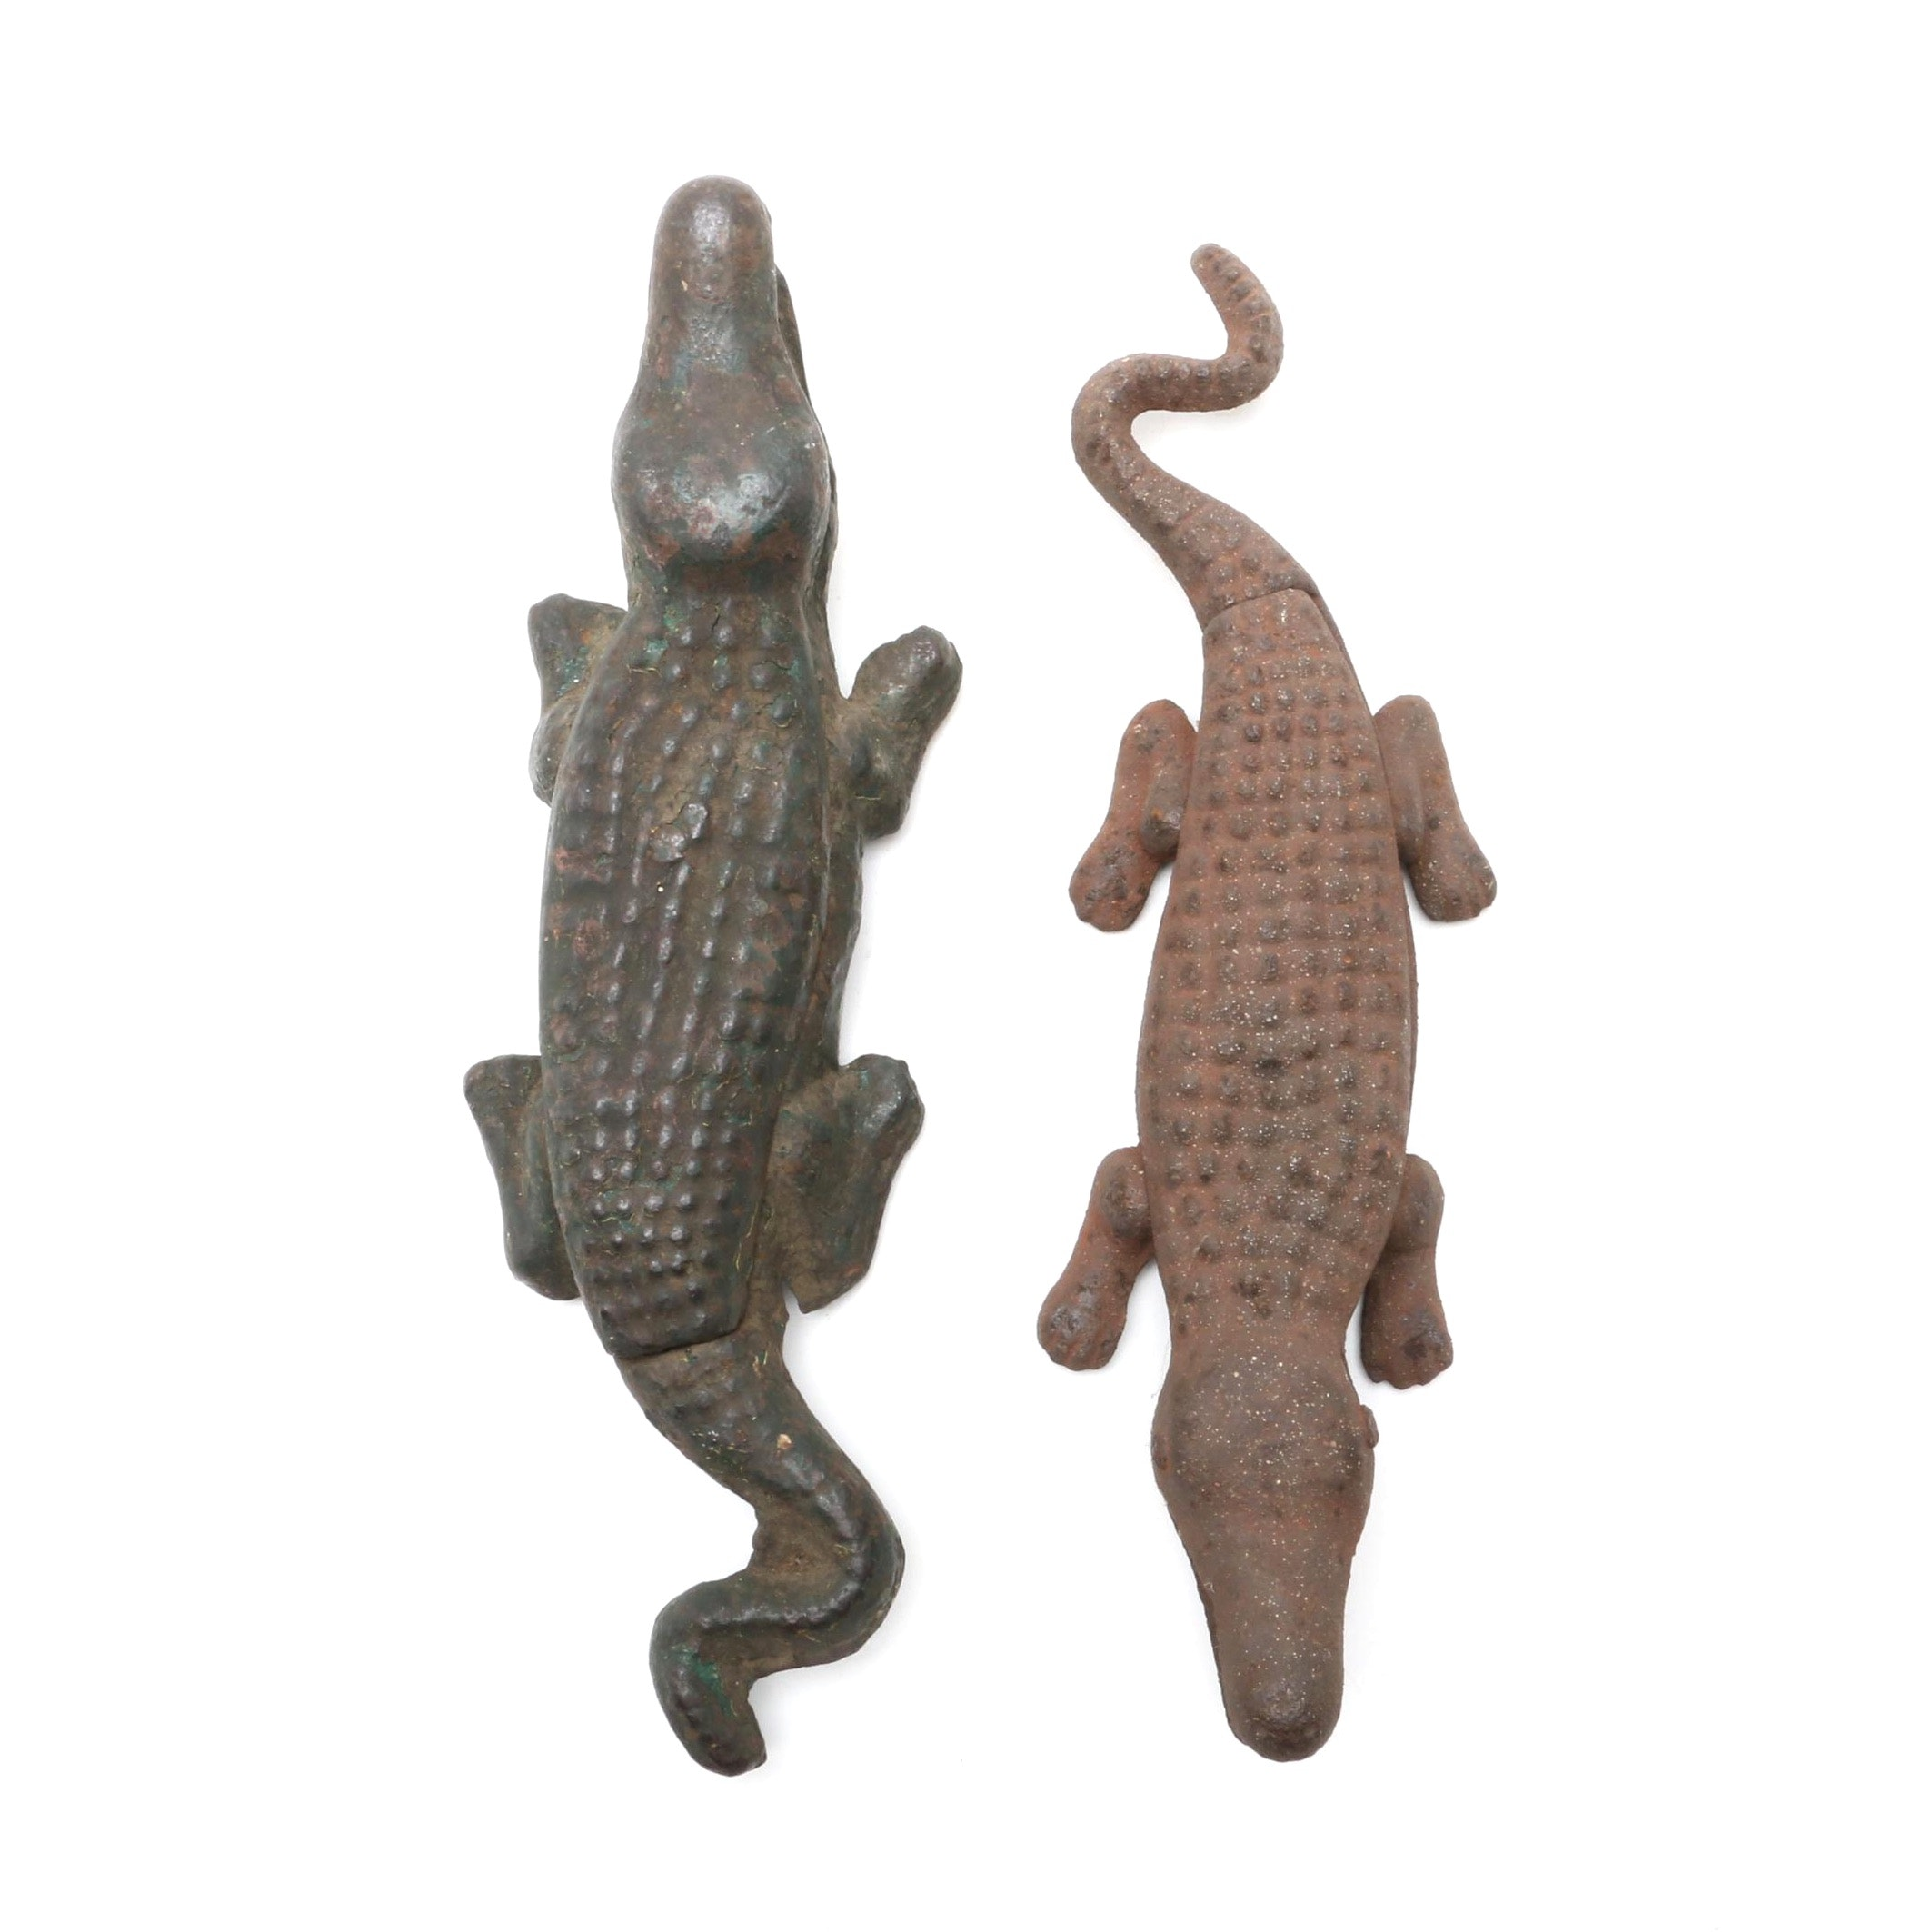 Cast-Iron Alligator Match Safe and Paperweight